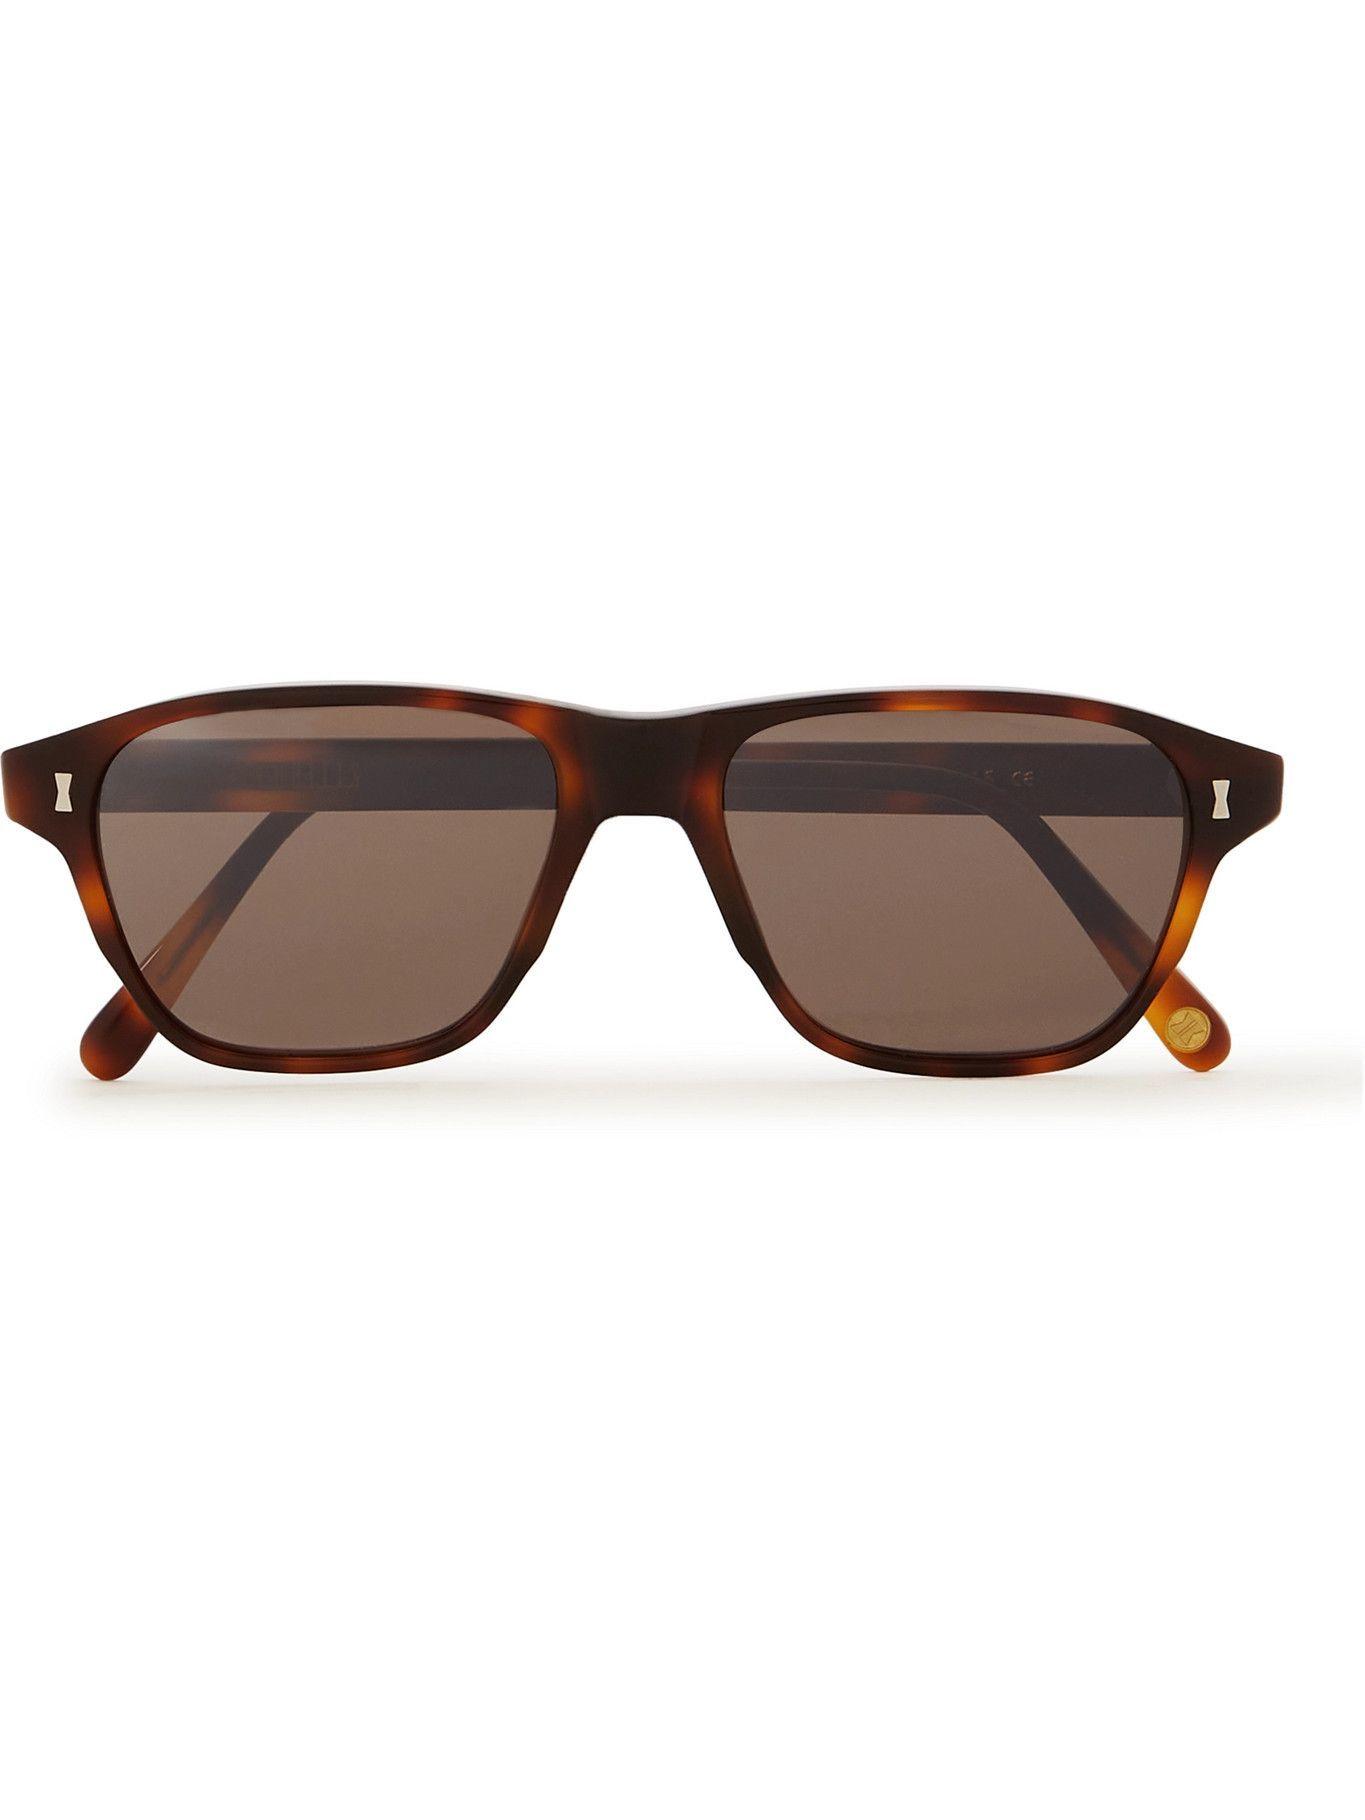 CUBITTS - Chalton Square-Frame Tortoiseshell Acetate Sunglasses